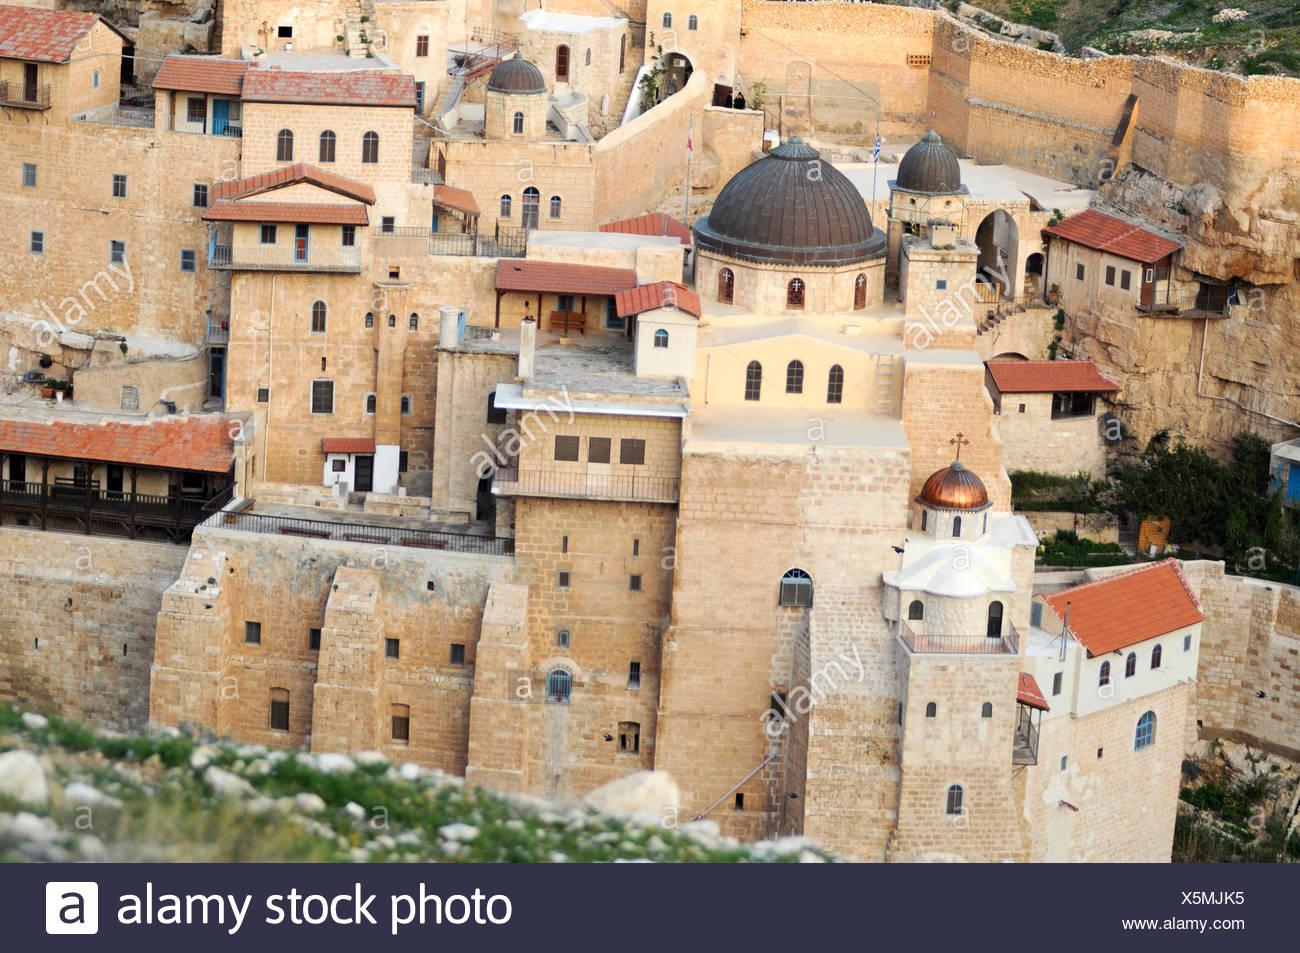 Israel, Judaea Dessert, Wadi Kidron, The Great Lavra of St. Sabas (also Mar Saba) is a Greek Orthodox monastery overlooking the - Stock Image